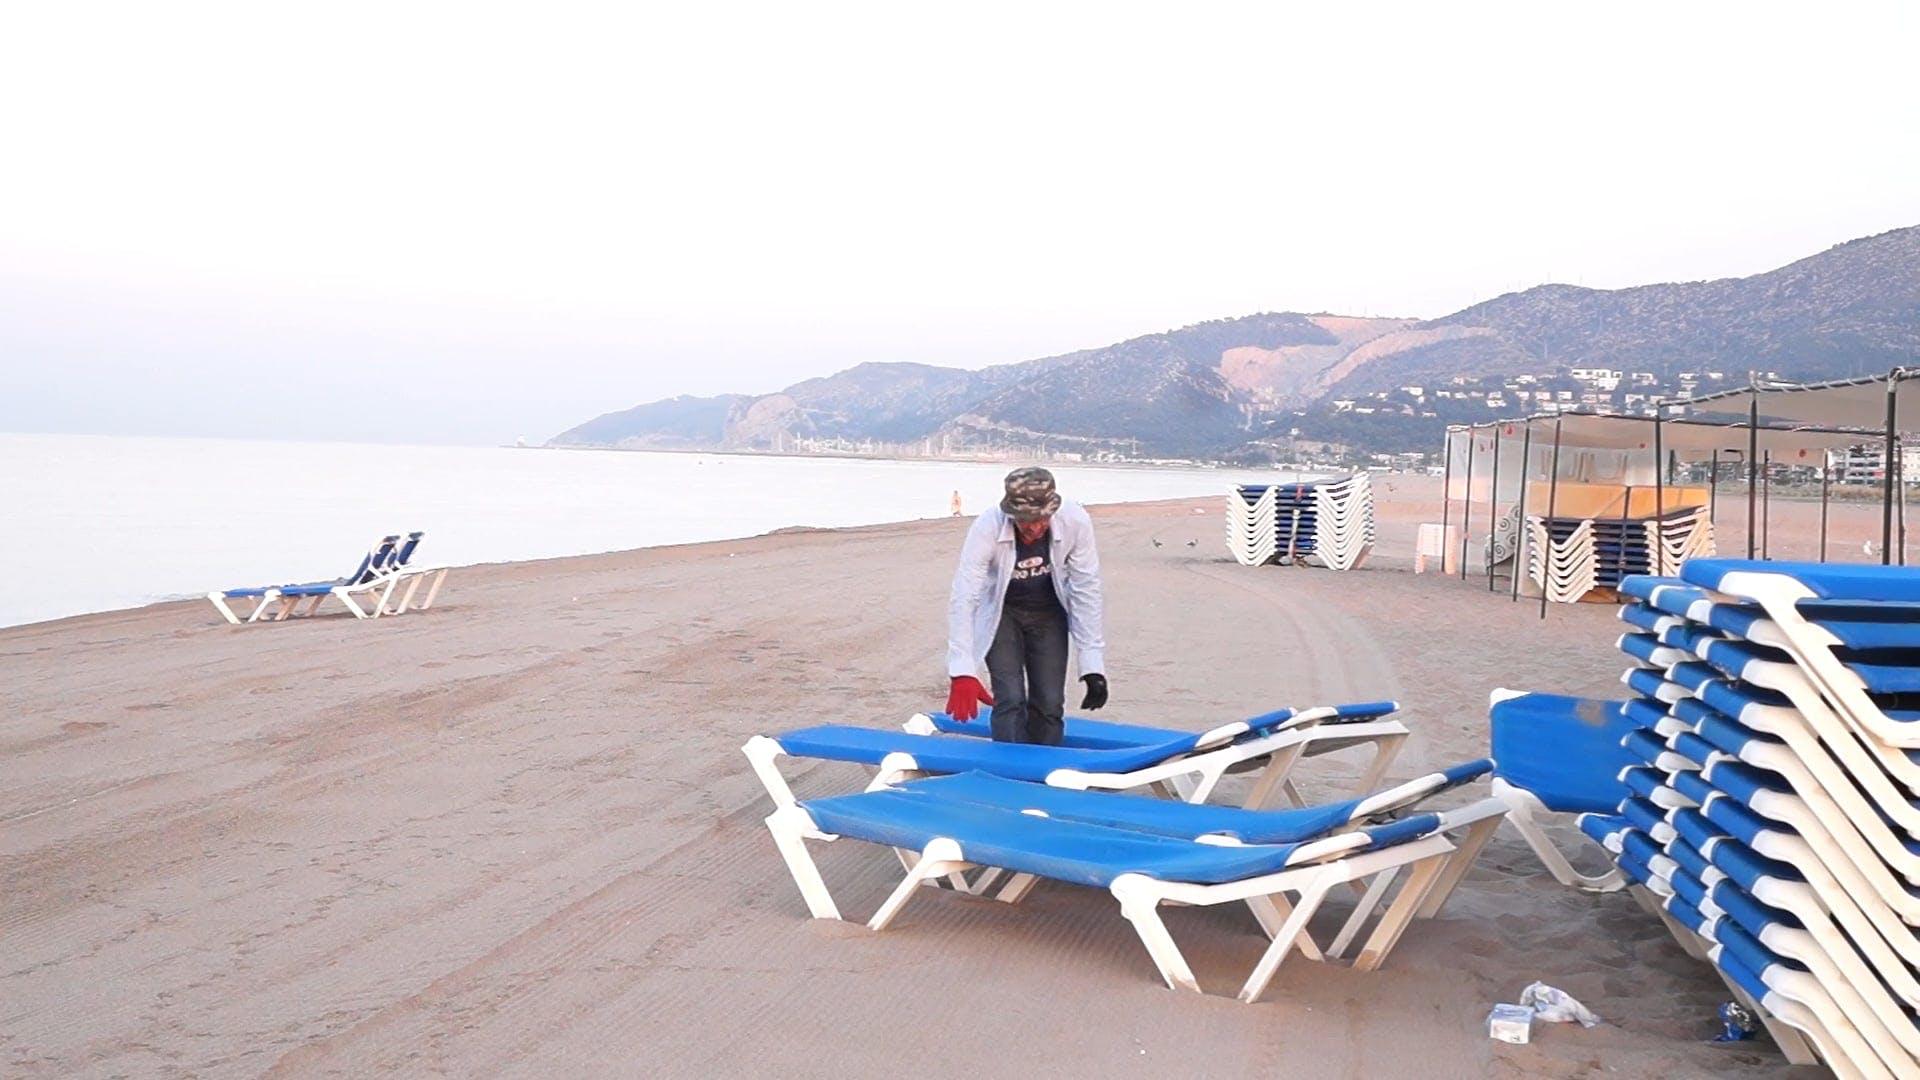 Man Setting Up Beach Chairs